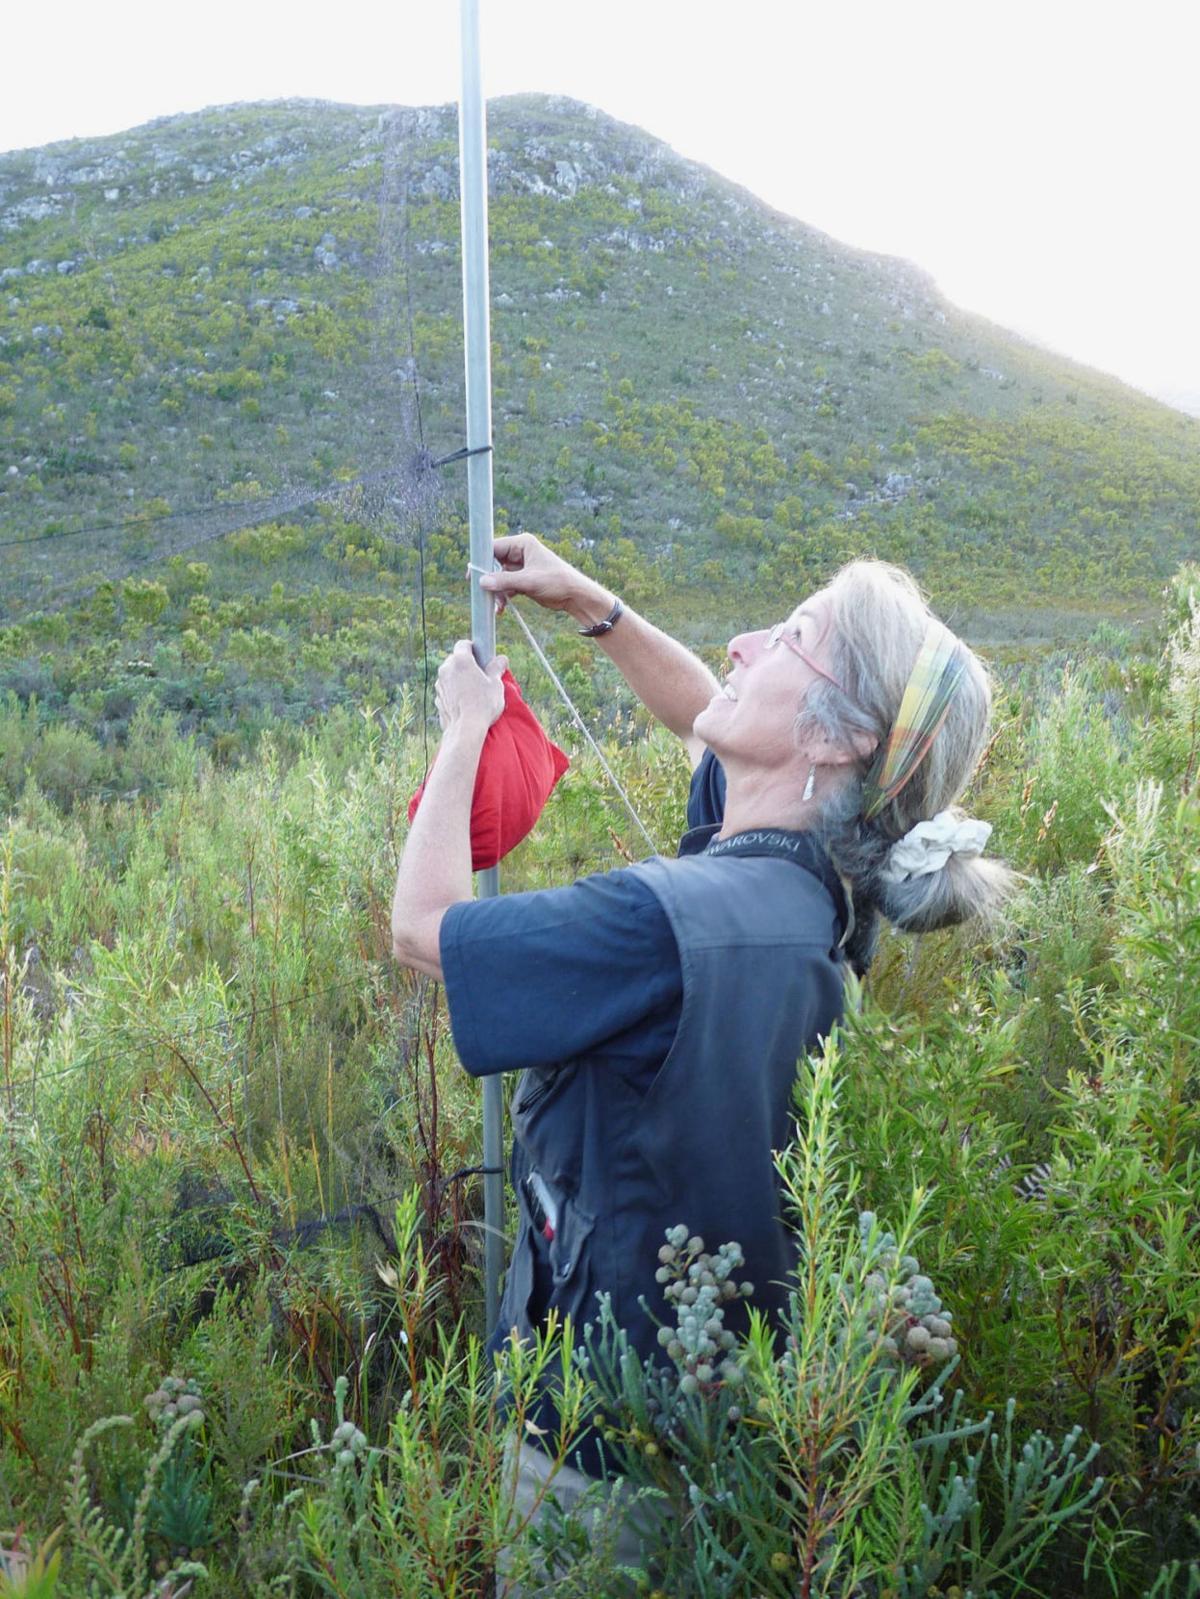 Anacortes based conservation organization closing